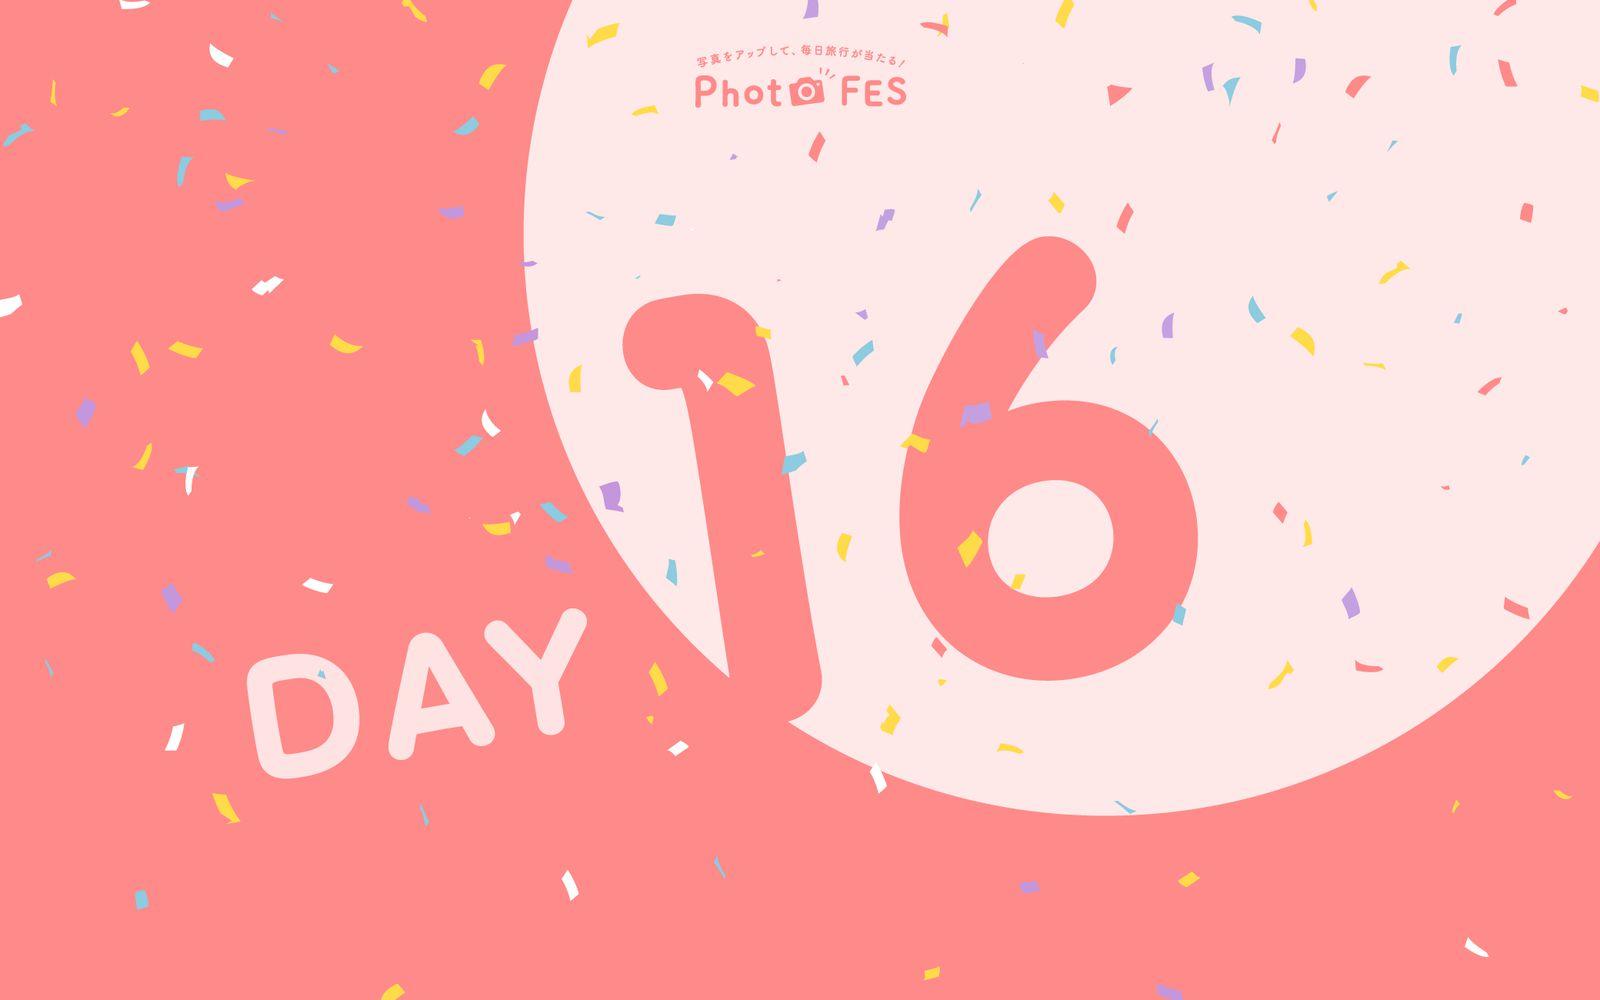 【DAY16】「Photo FES Summer シーズン2」9月1日投稿分であたる賞品&受賞者発表